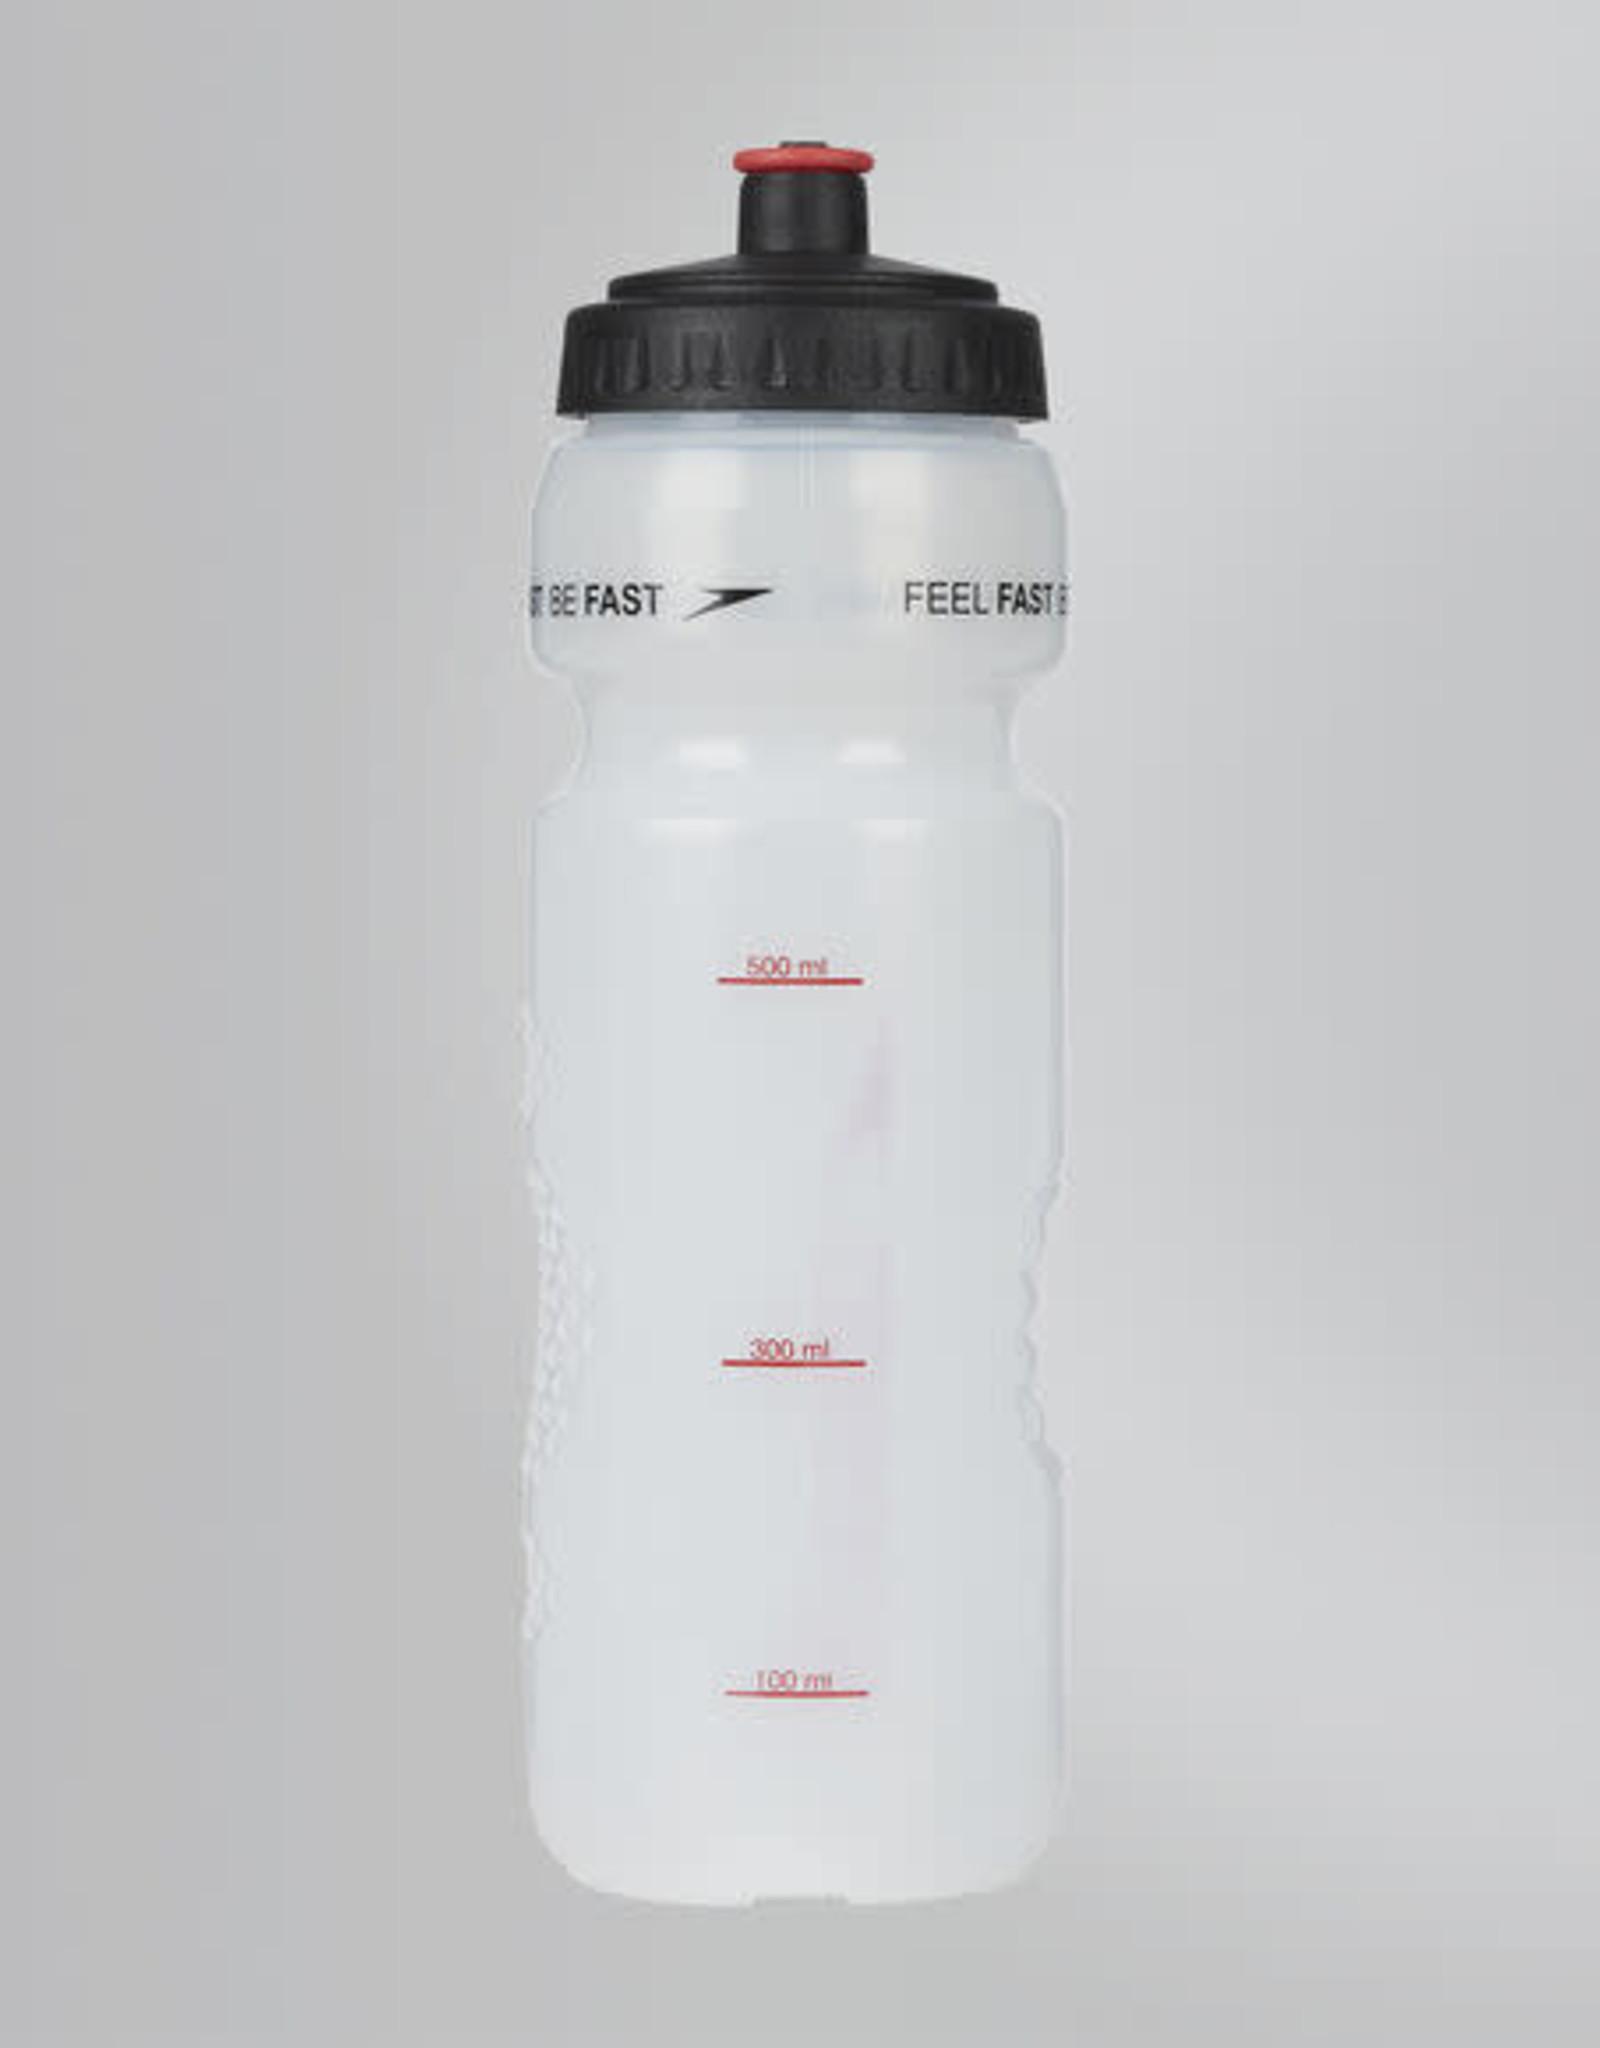 Speedo EQUIPMENT/ WATER BOTTLE 800ml red